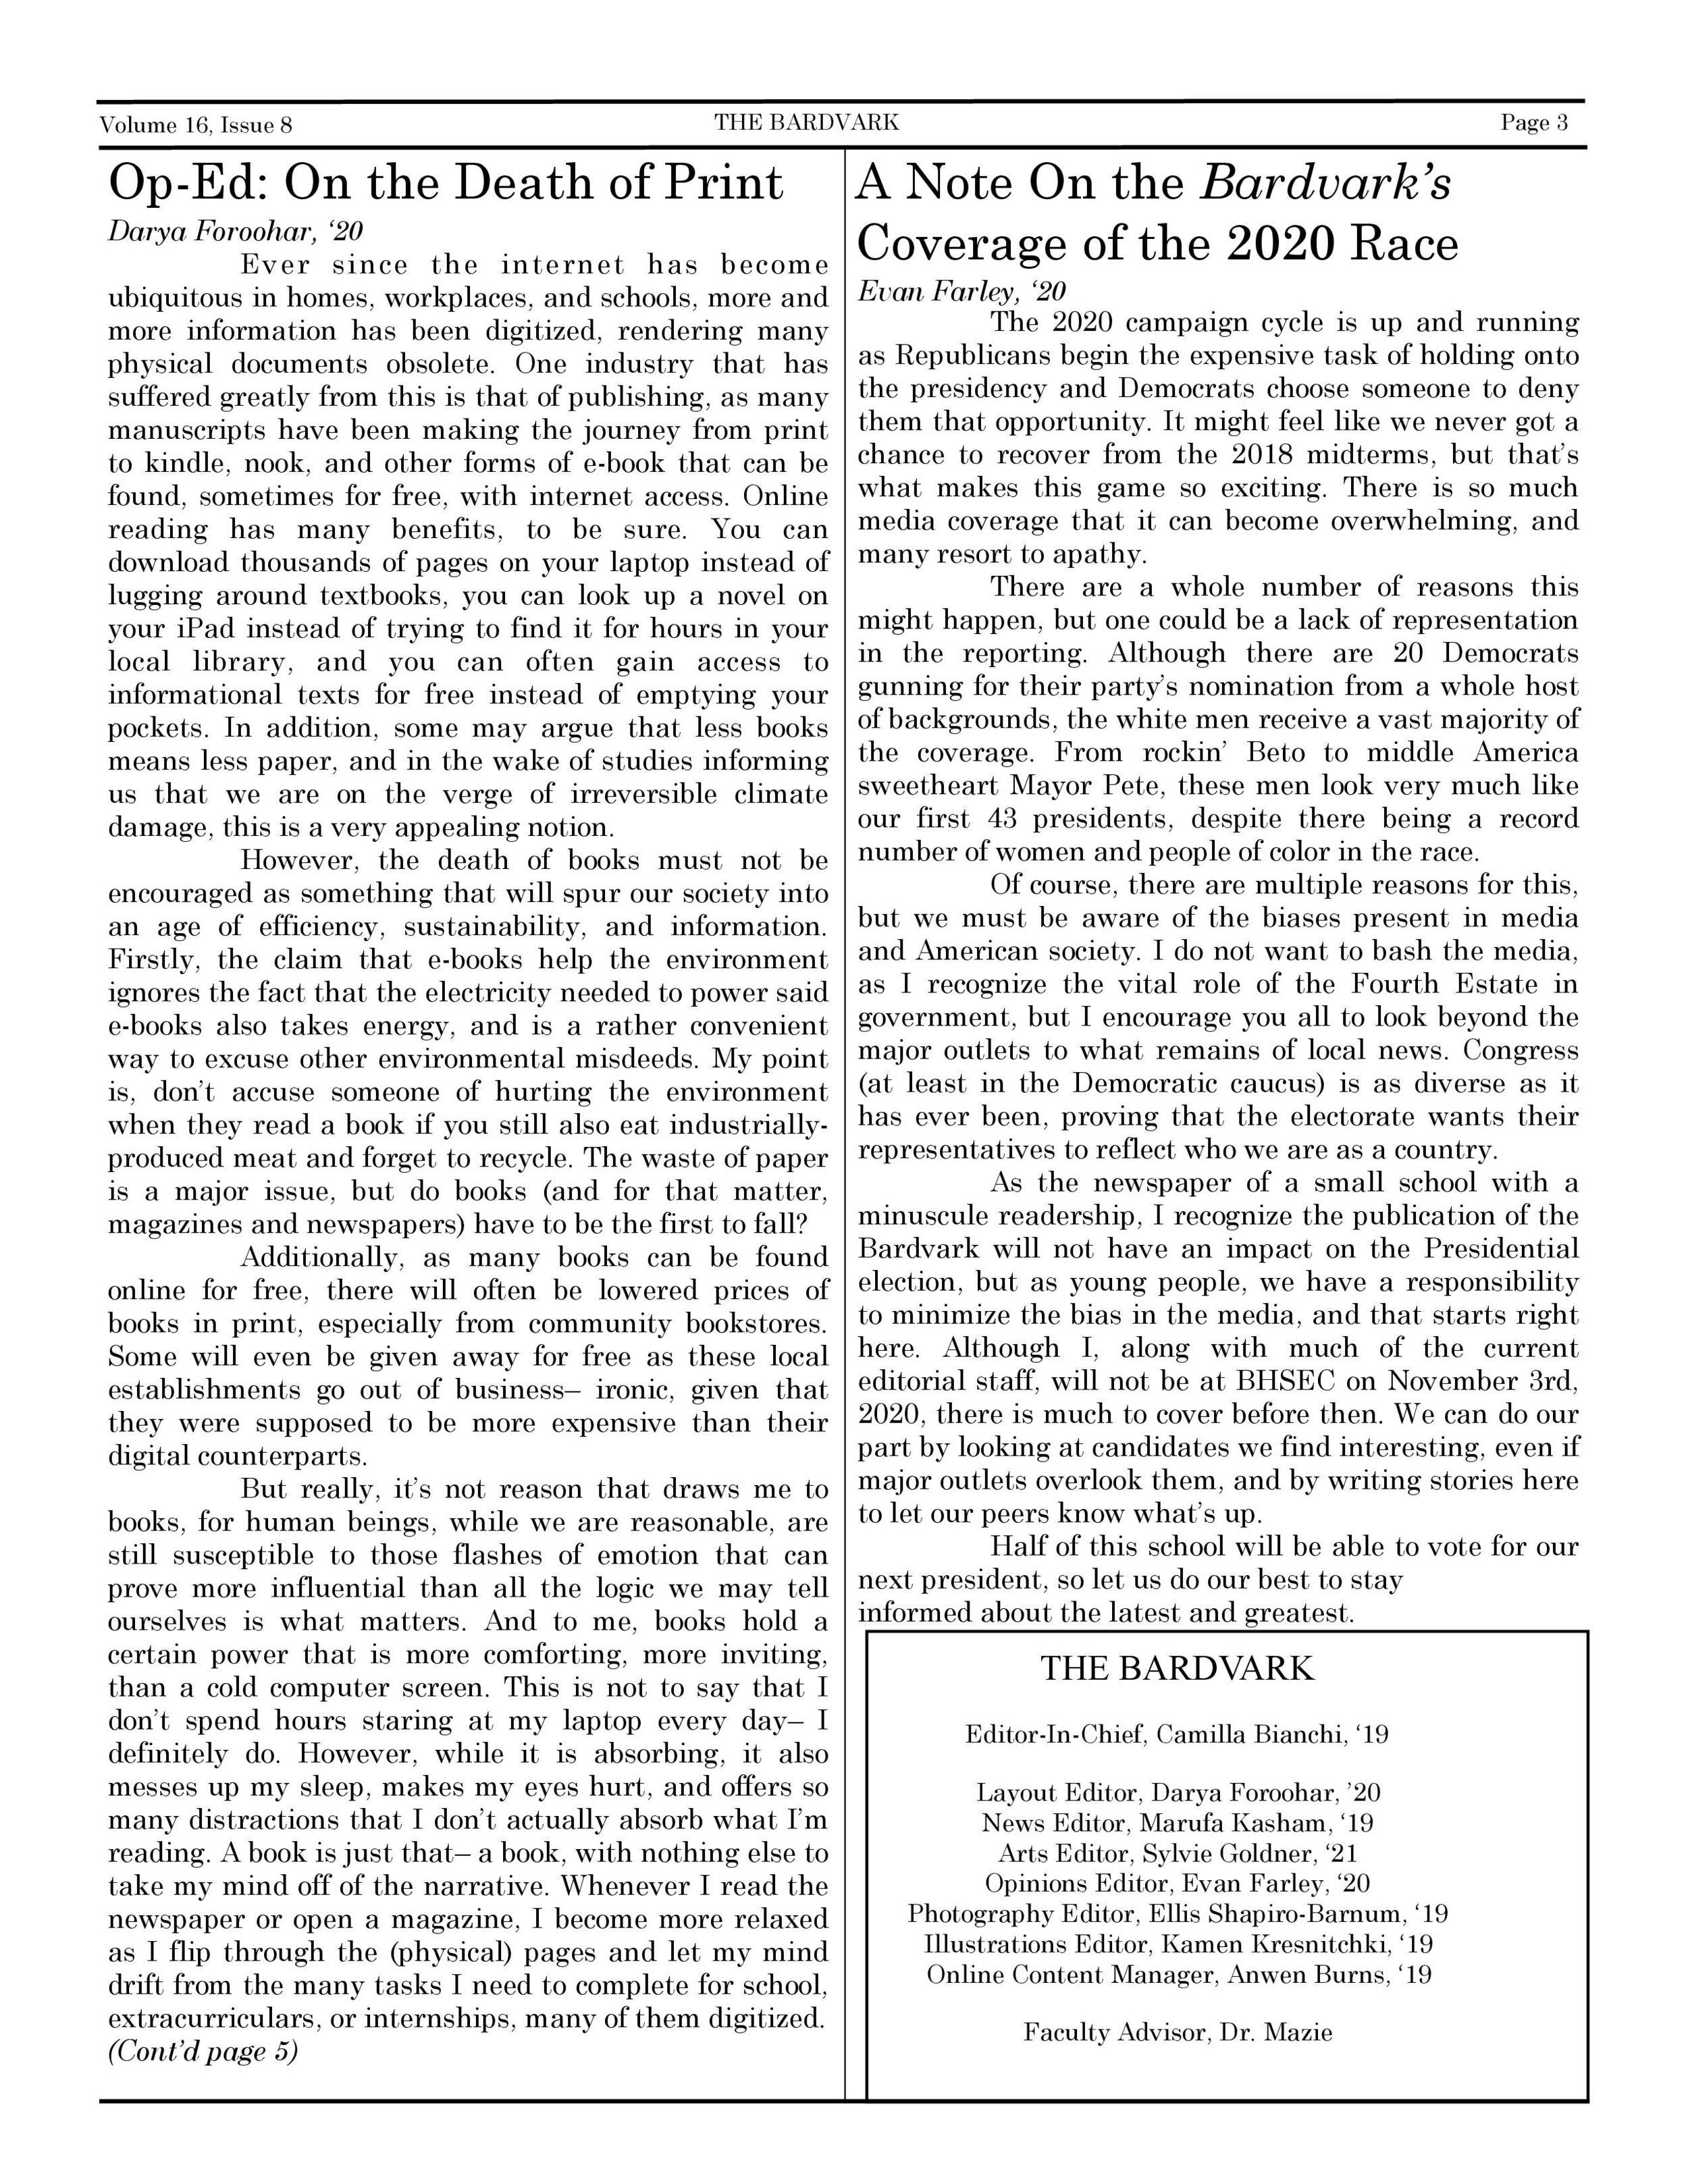 Issue 8 April 2019-3.jpg